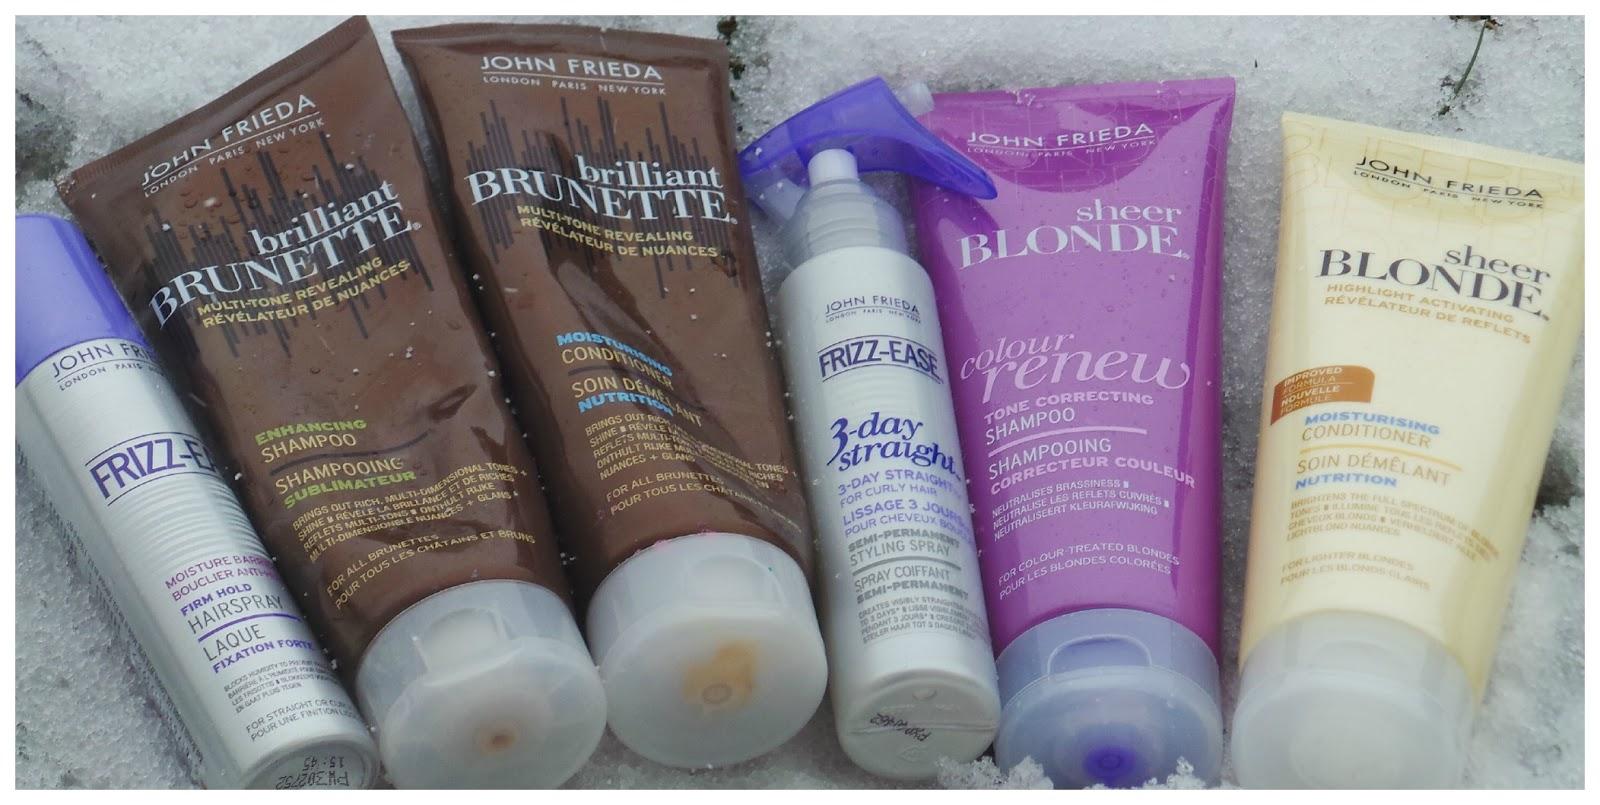 John Frieda Purple Shampoo Image of John Frieda Products